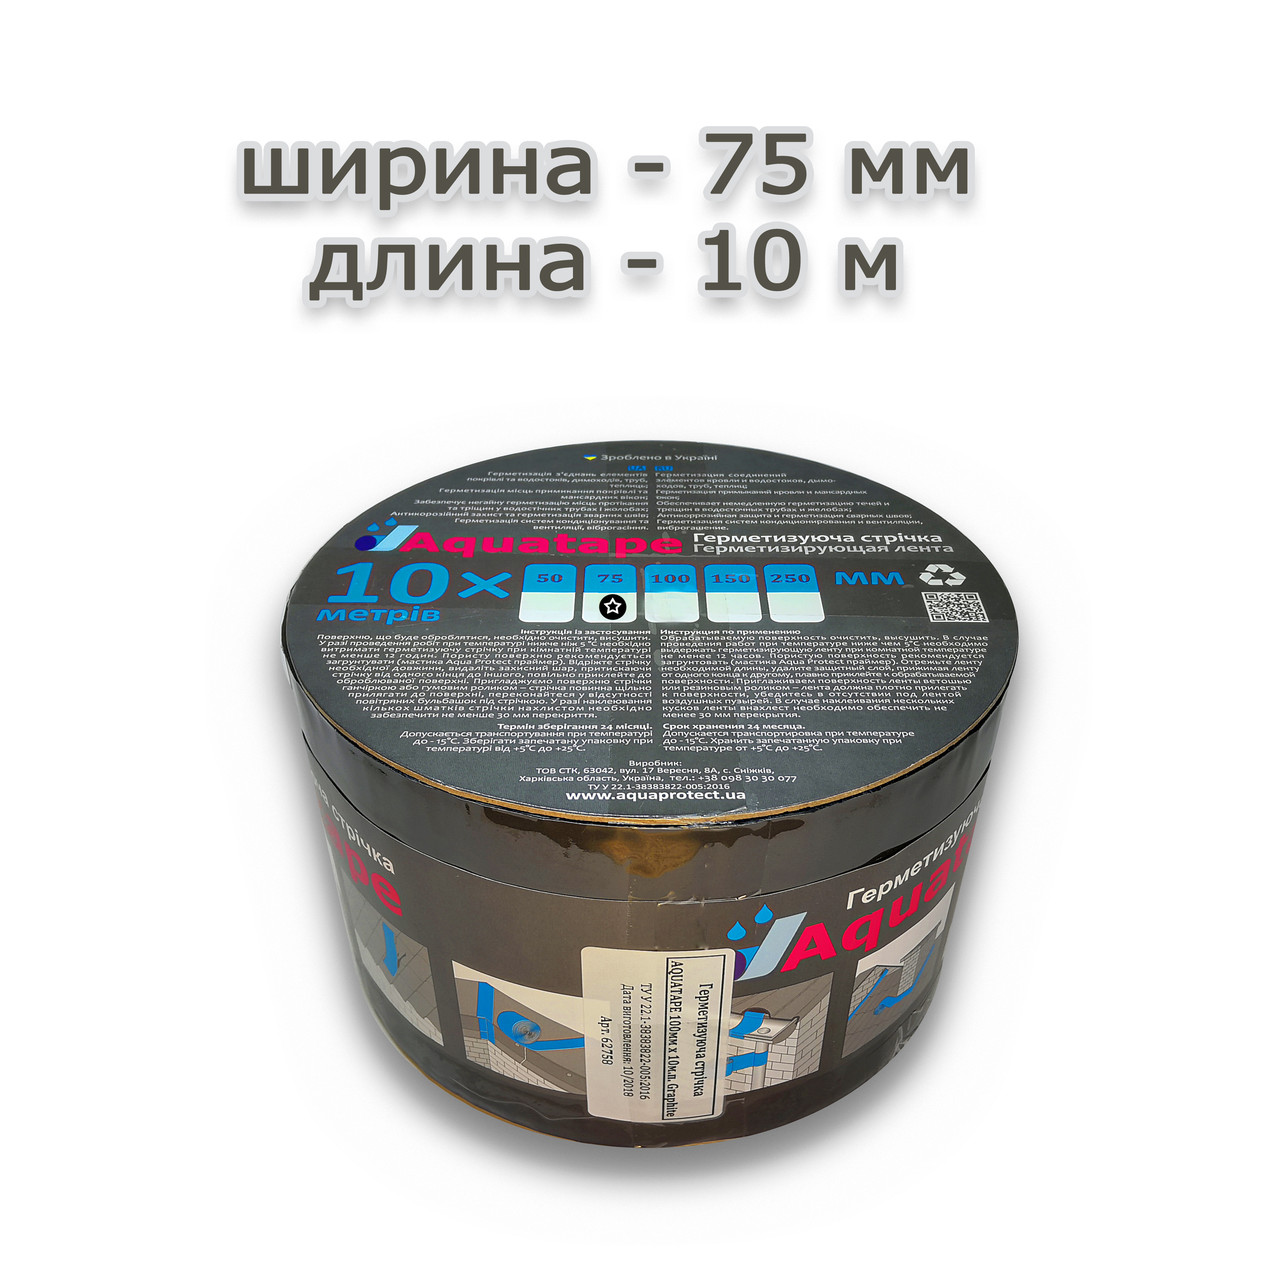 Битумная Лента 75 мм х 10 м ALU+Graphite RAL 7012